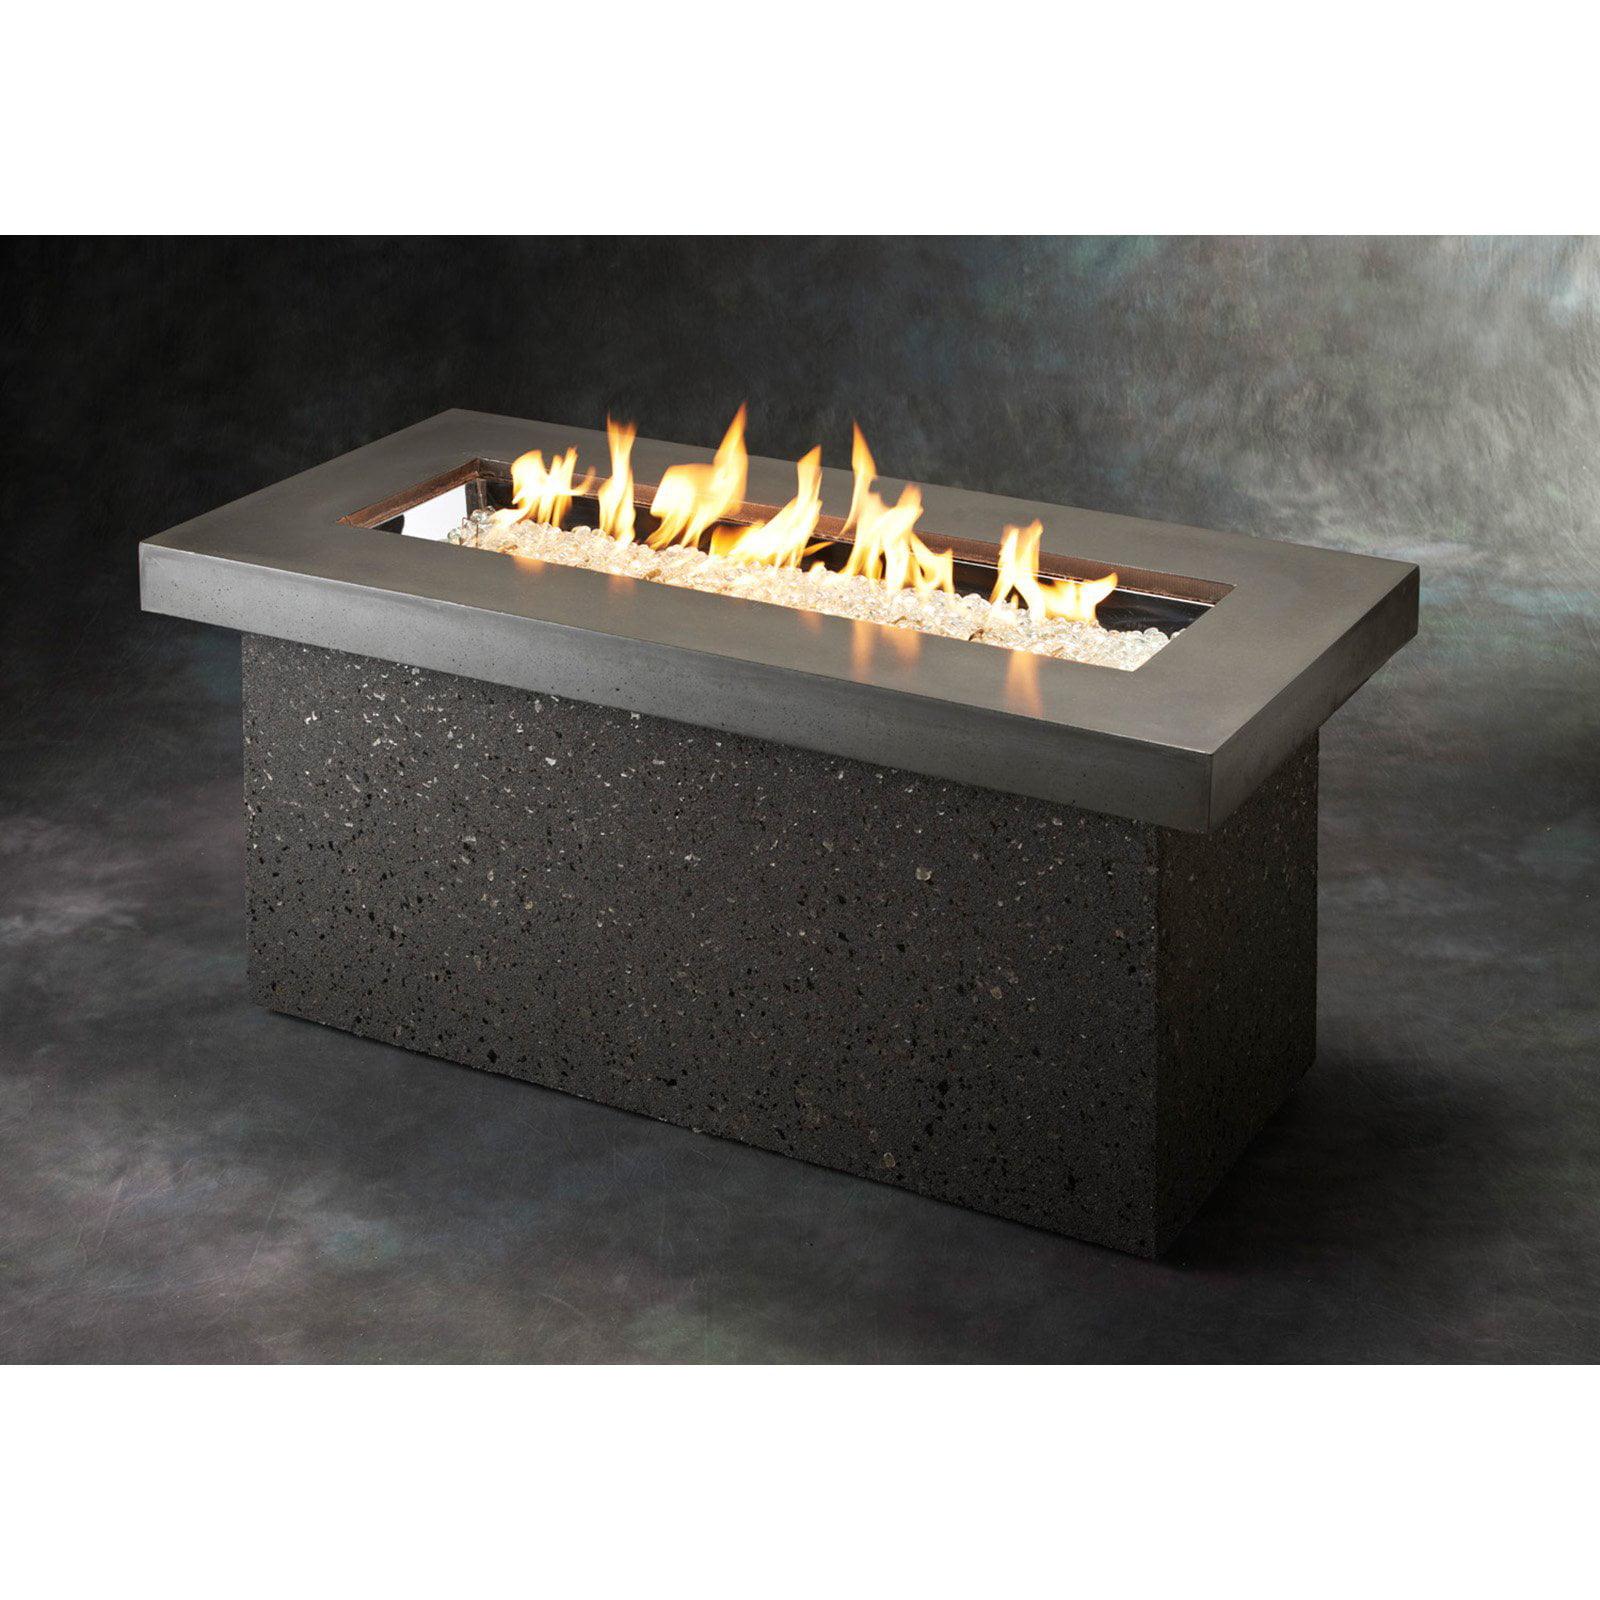 Outdoor GreatRoom Key Largo 54 In. Fire Table   Walmart.com